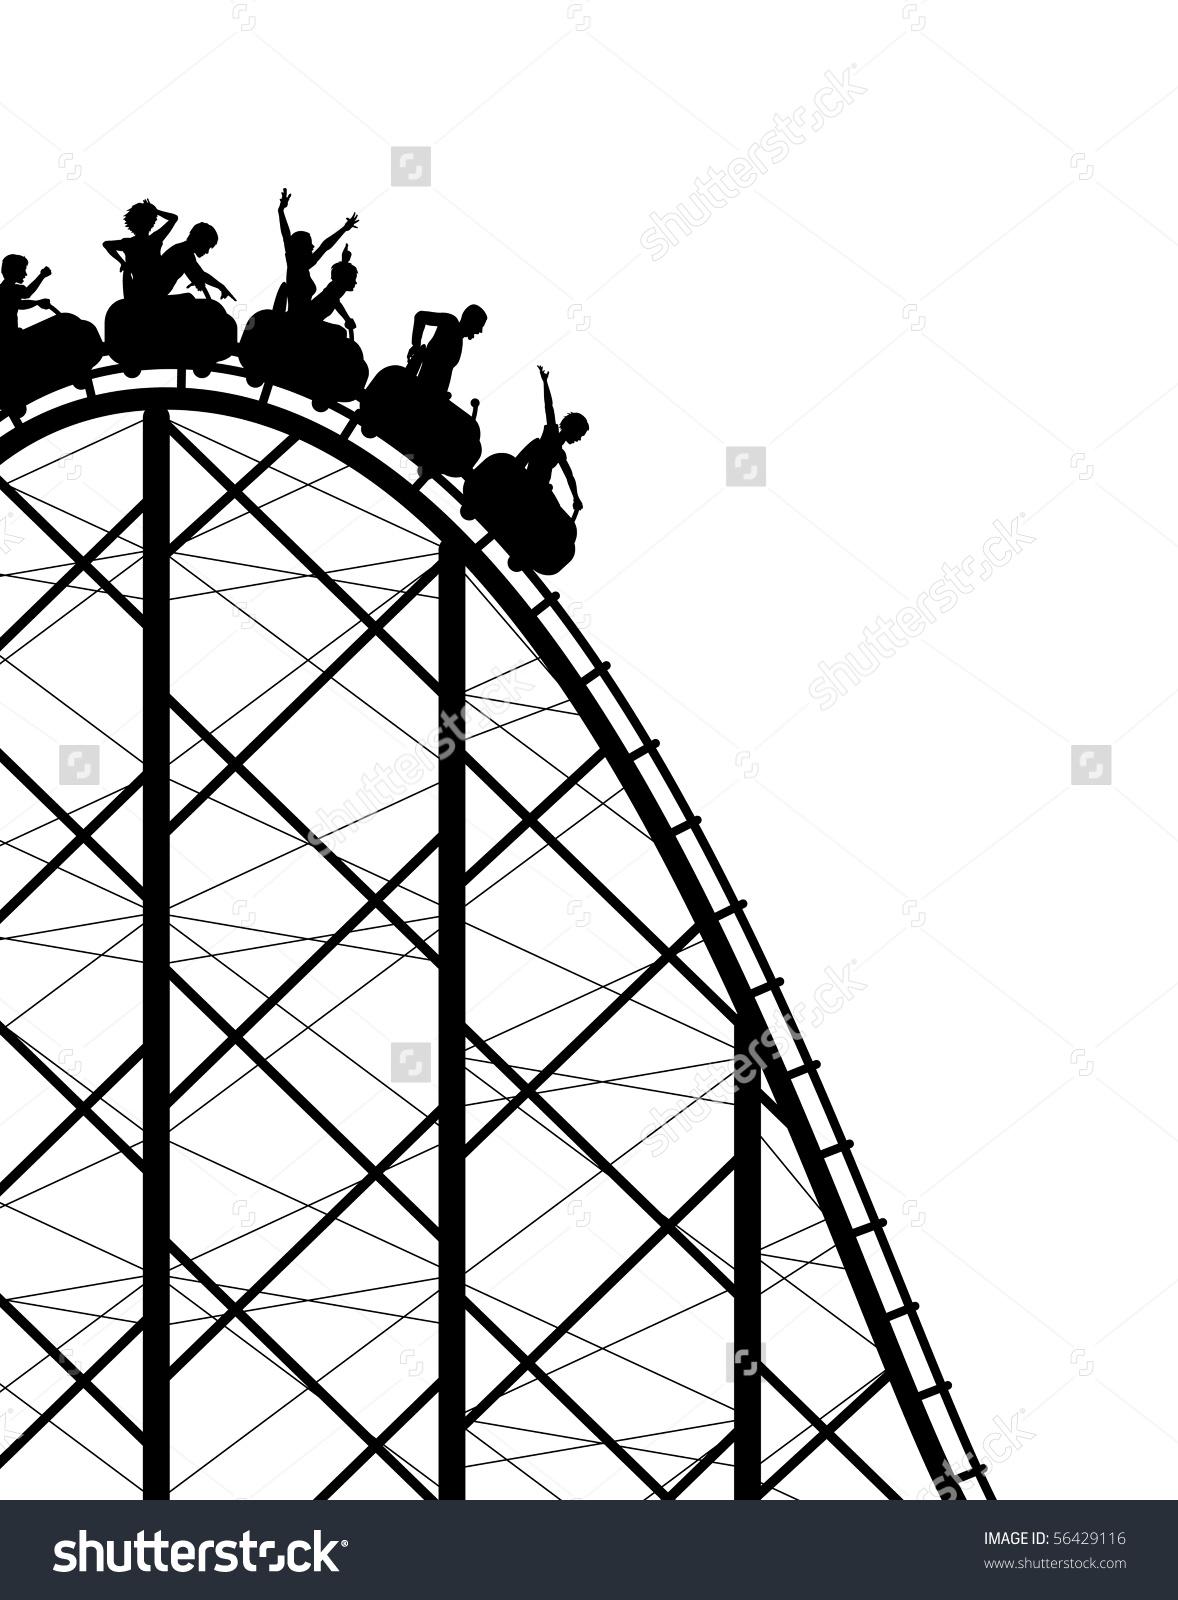 Editable Vector Silhouette Steep Rollercoaster Ride Stock Vector.